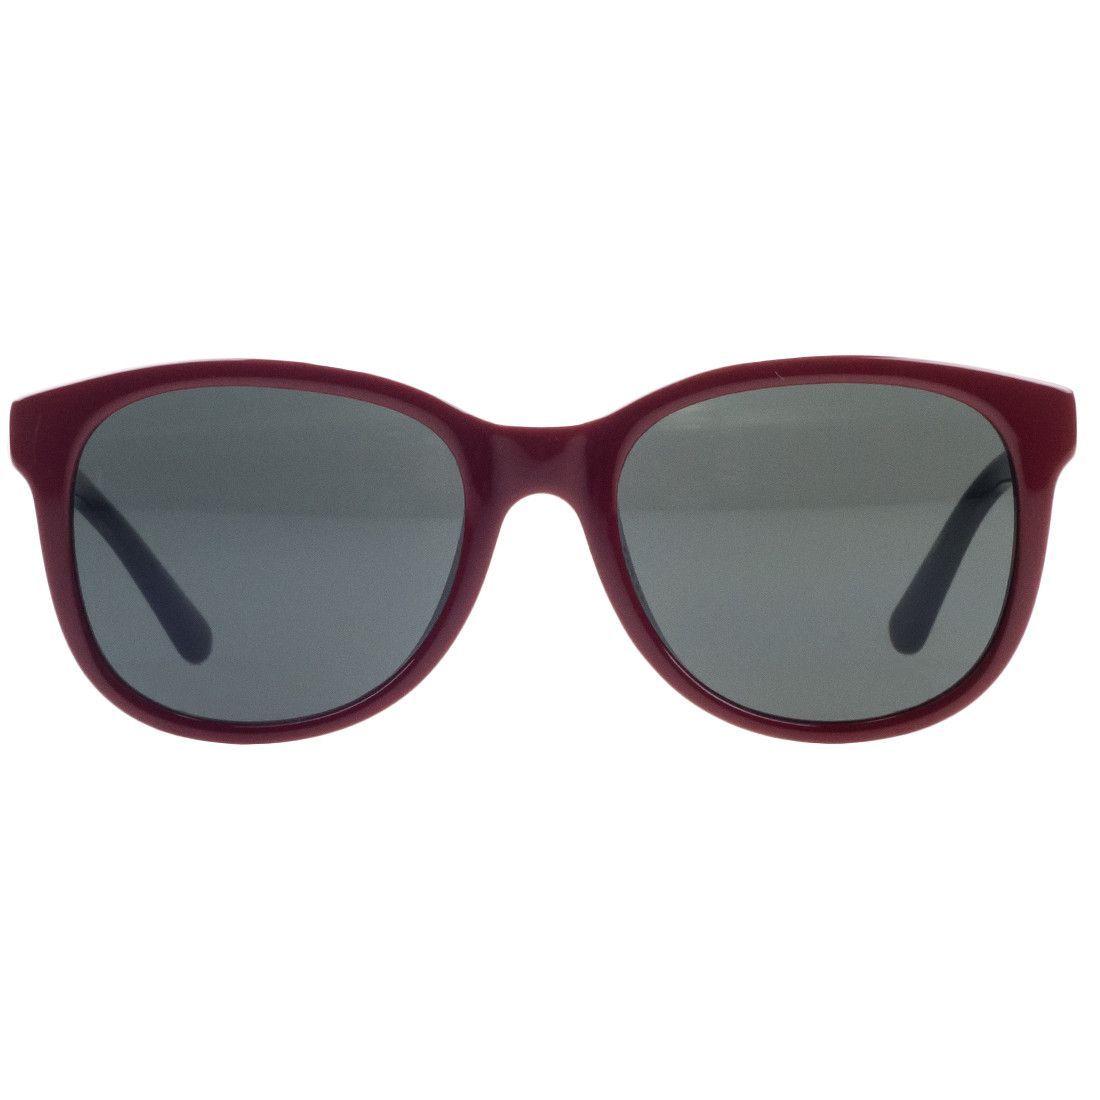 6cbcfa20d156 Lacoste L3603 S 615 Red Wayfarer Sunglasses